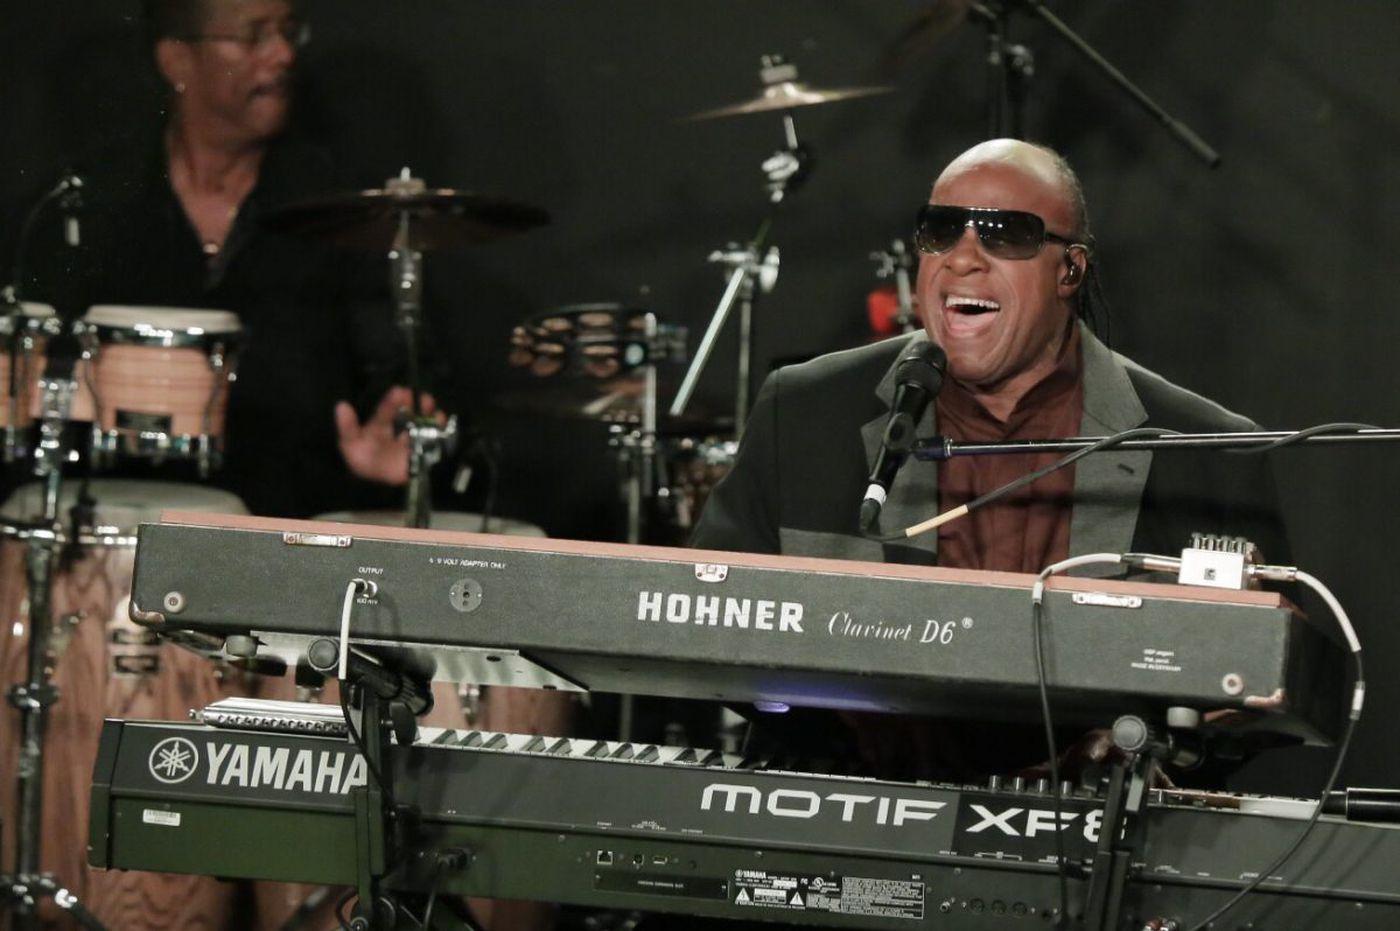 Stevie Wonder to play Borgata in Atlantic City this summer